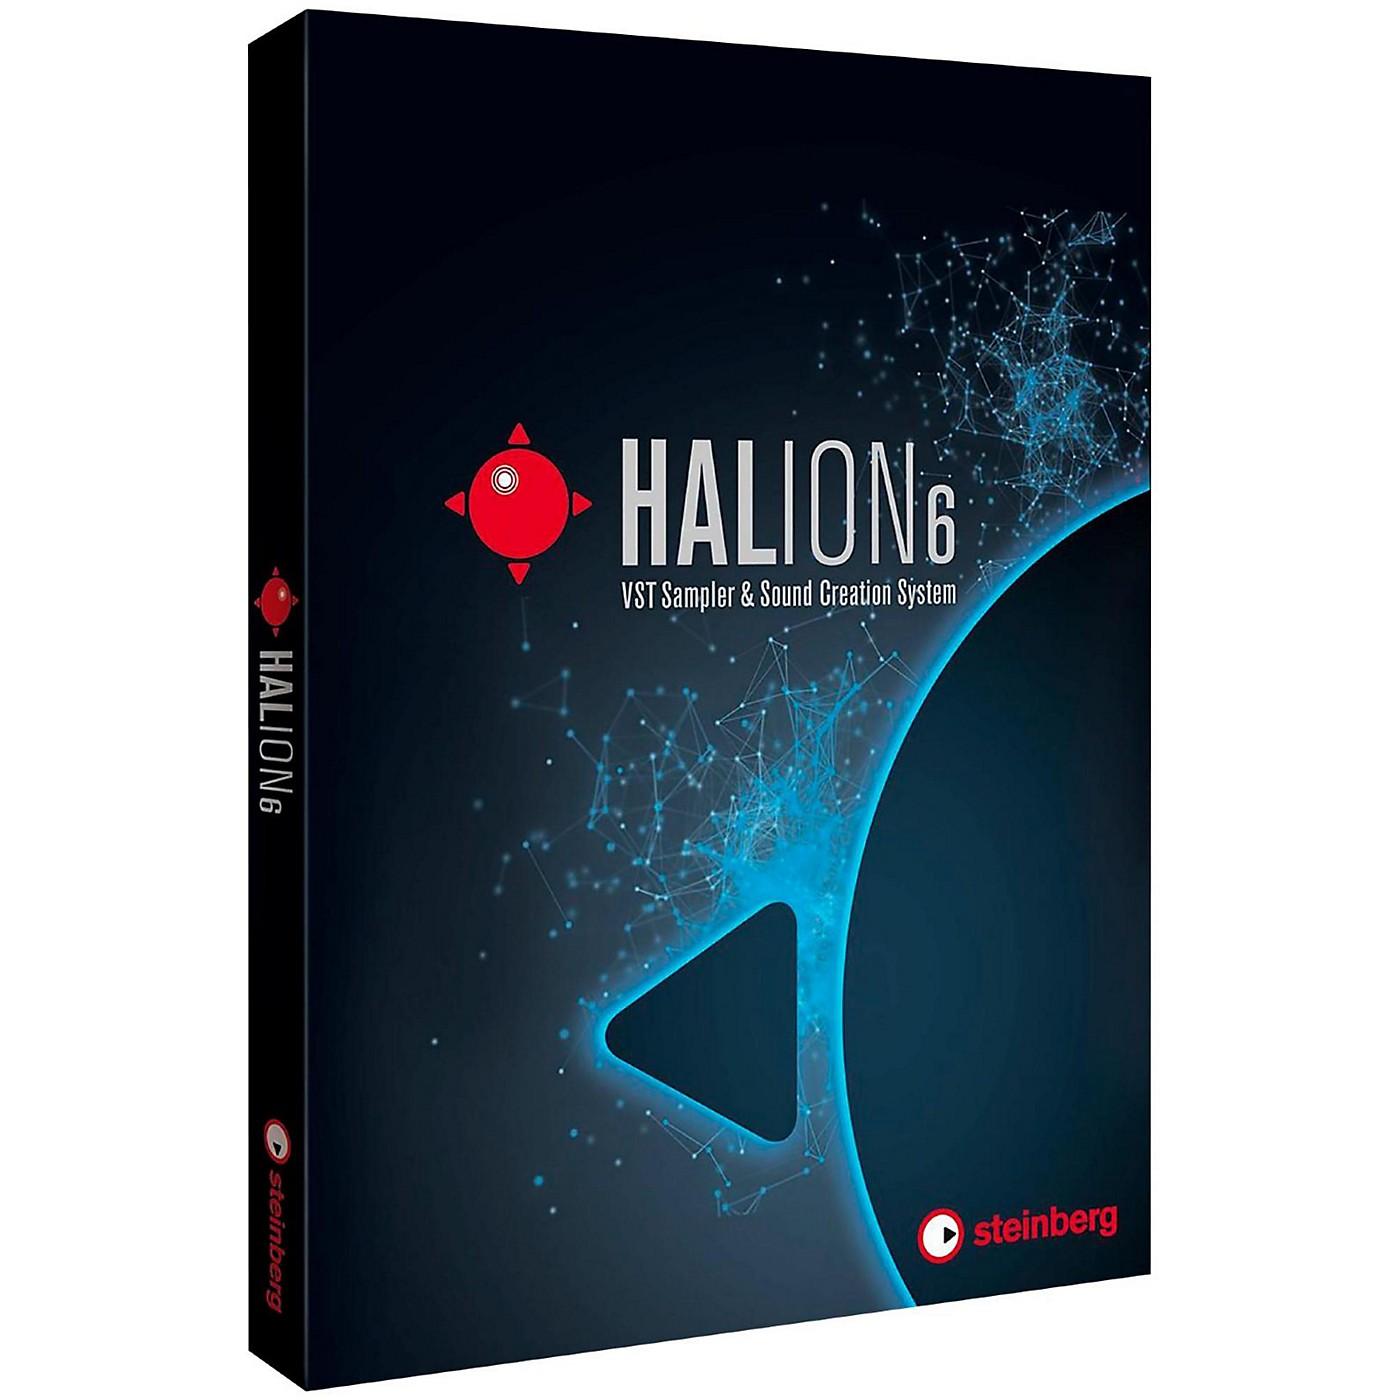 Steinberg HALion 6 thumbnail